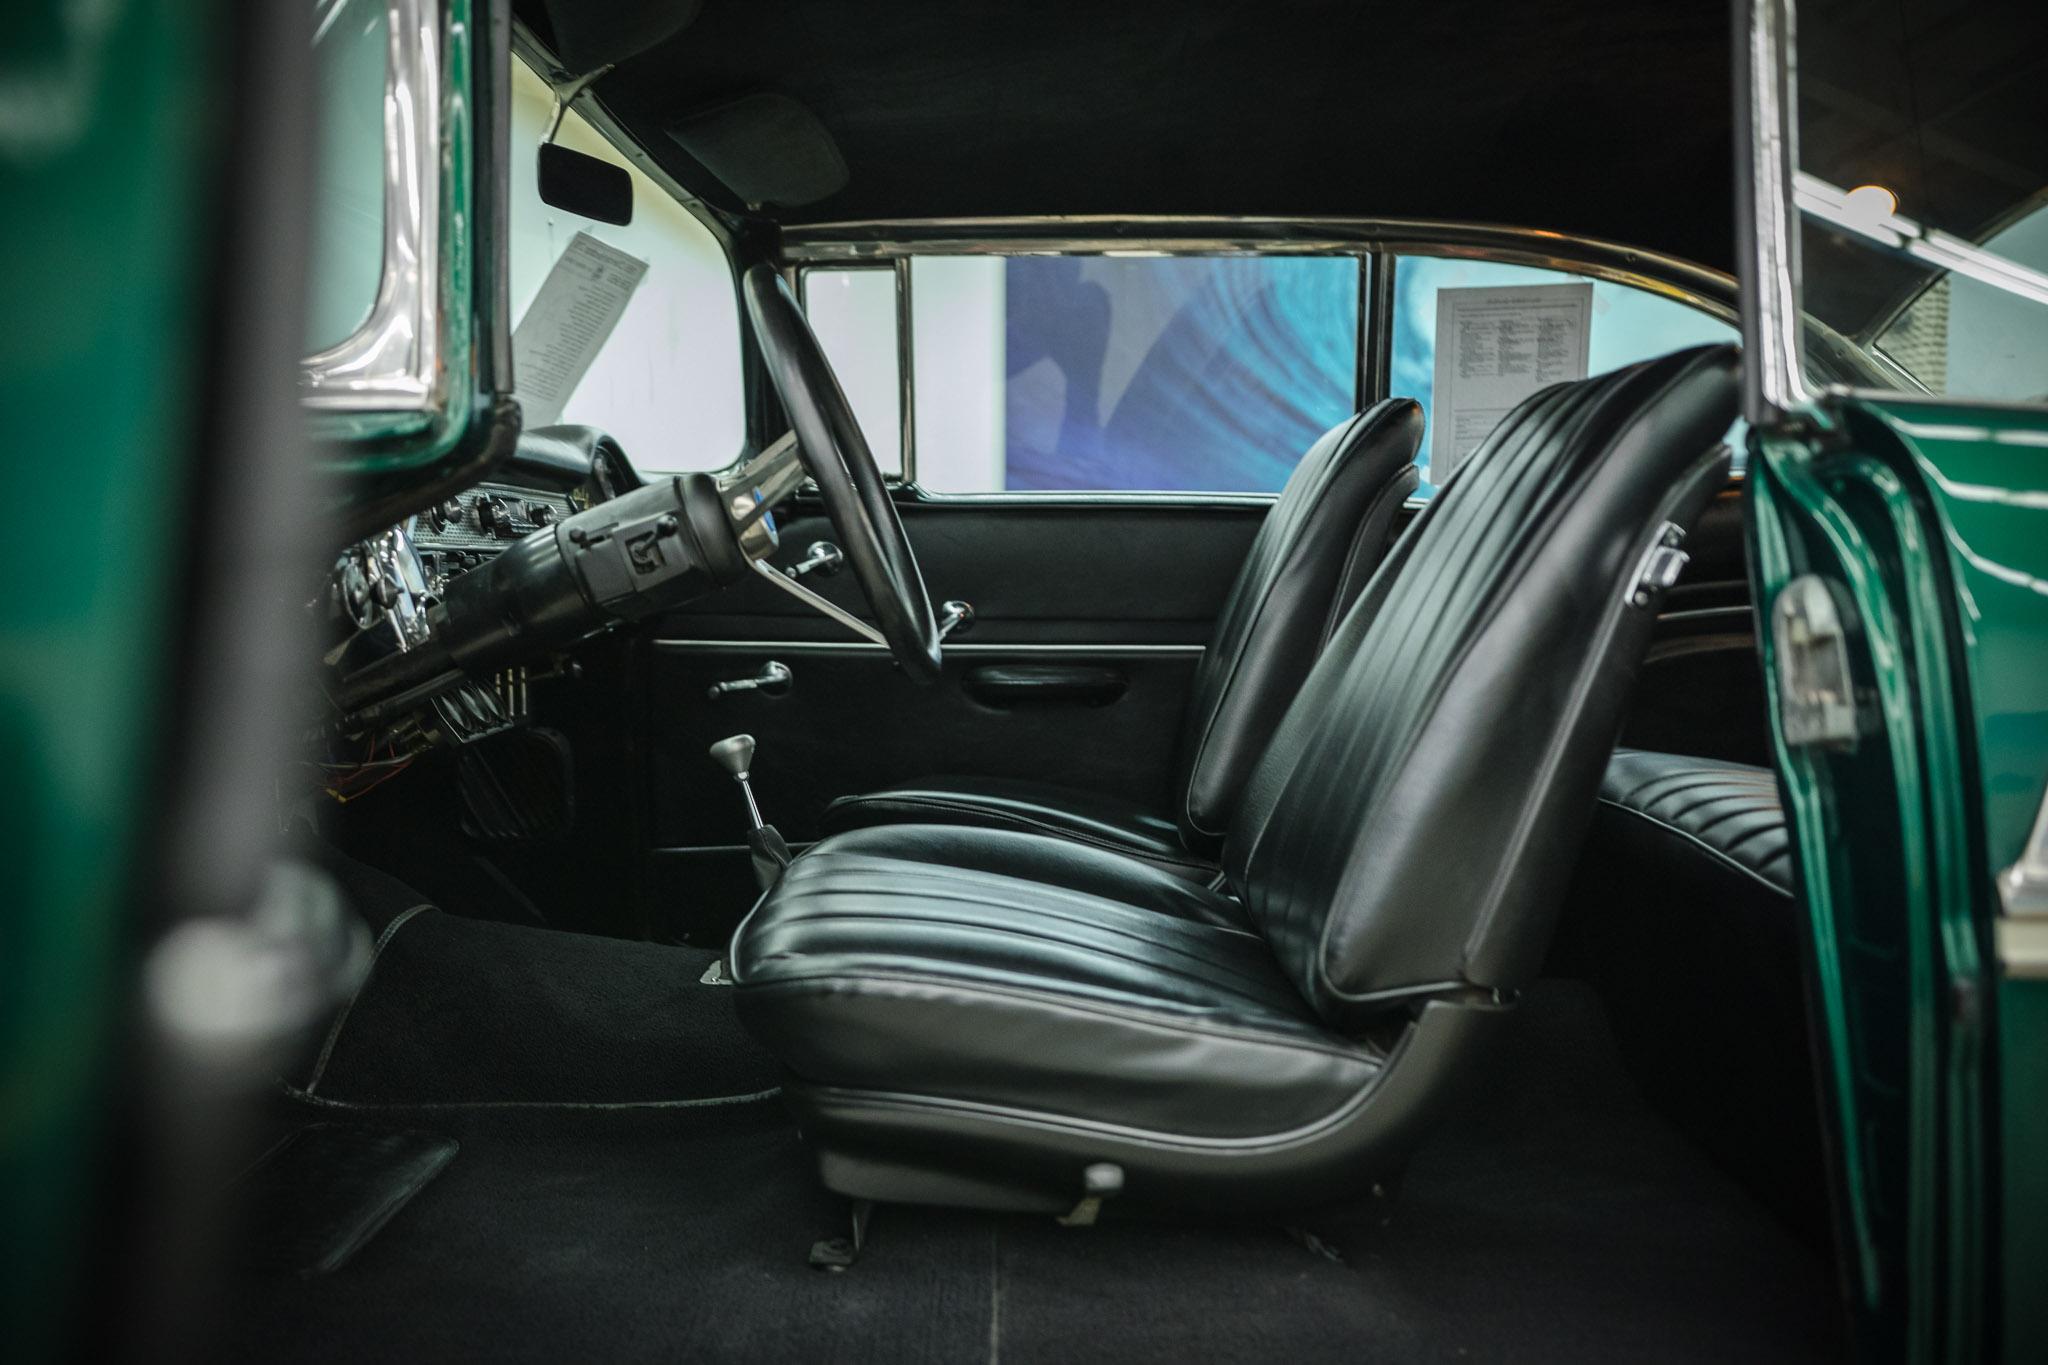 1955 Chevrolet Hardtop 210